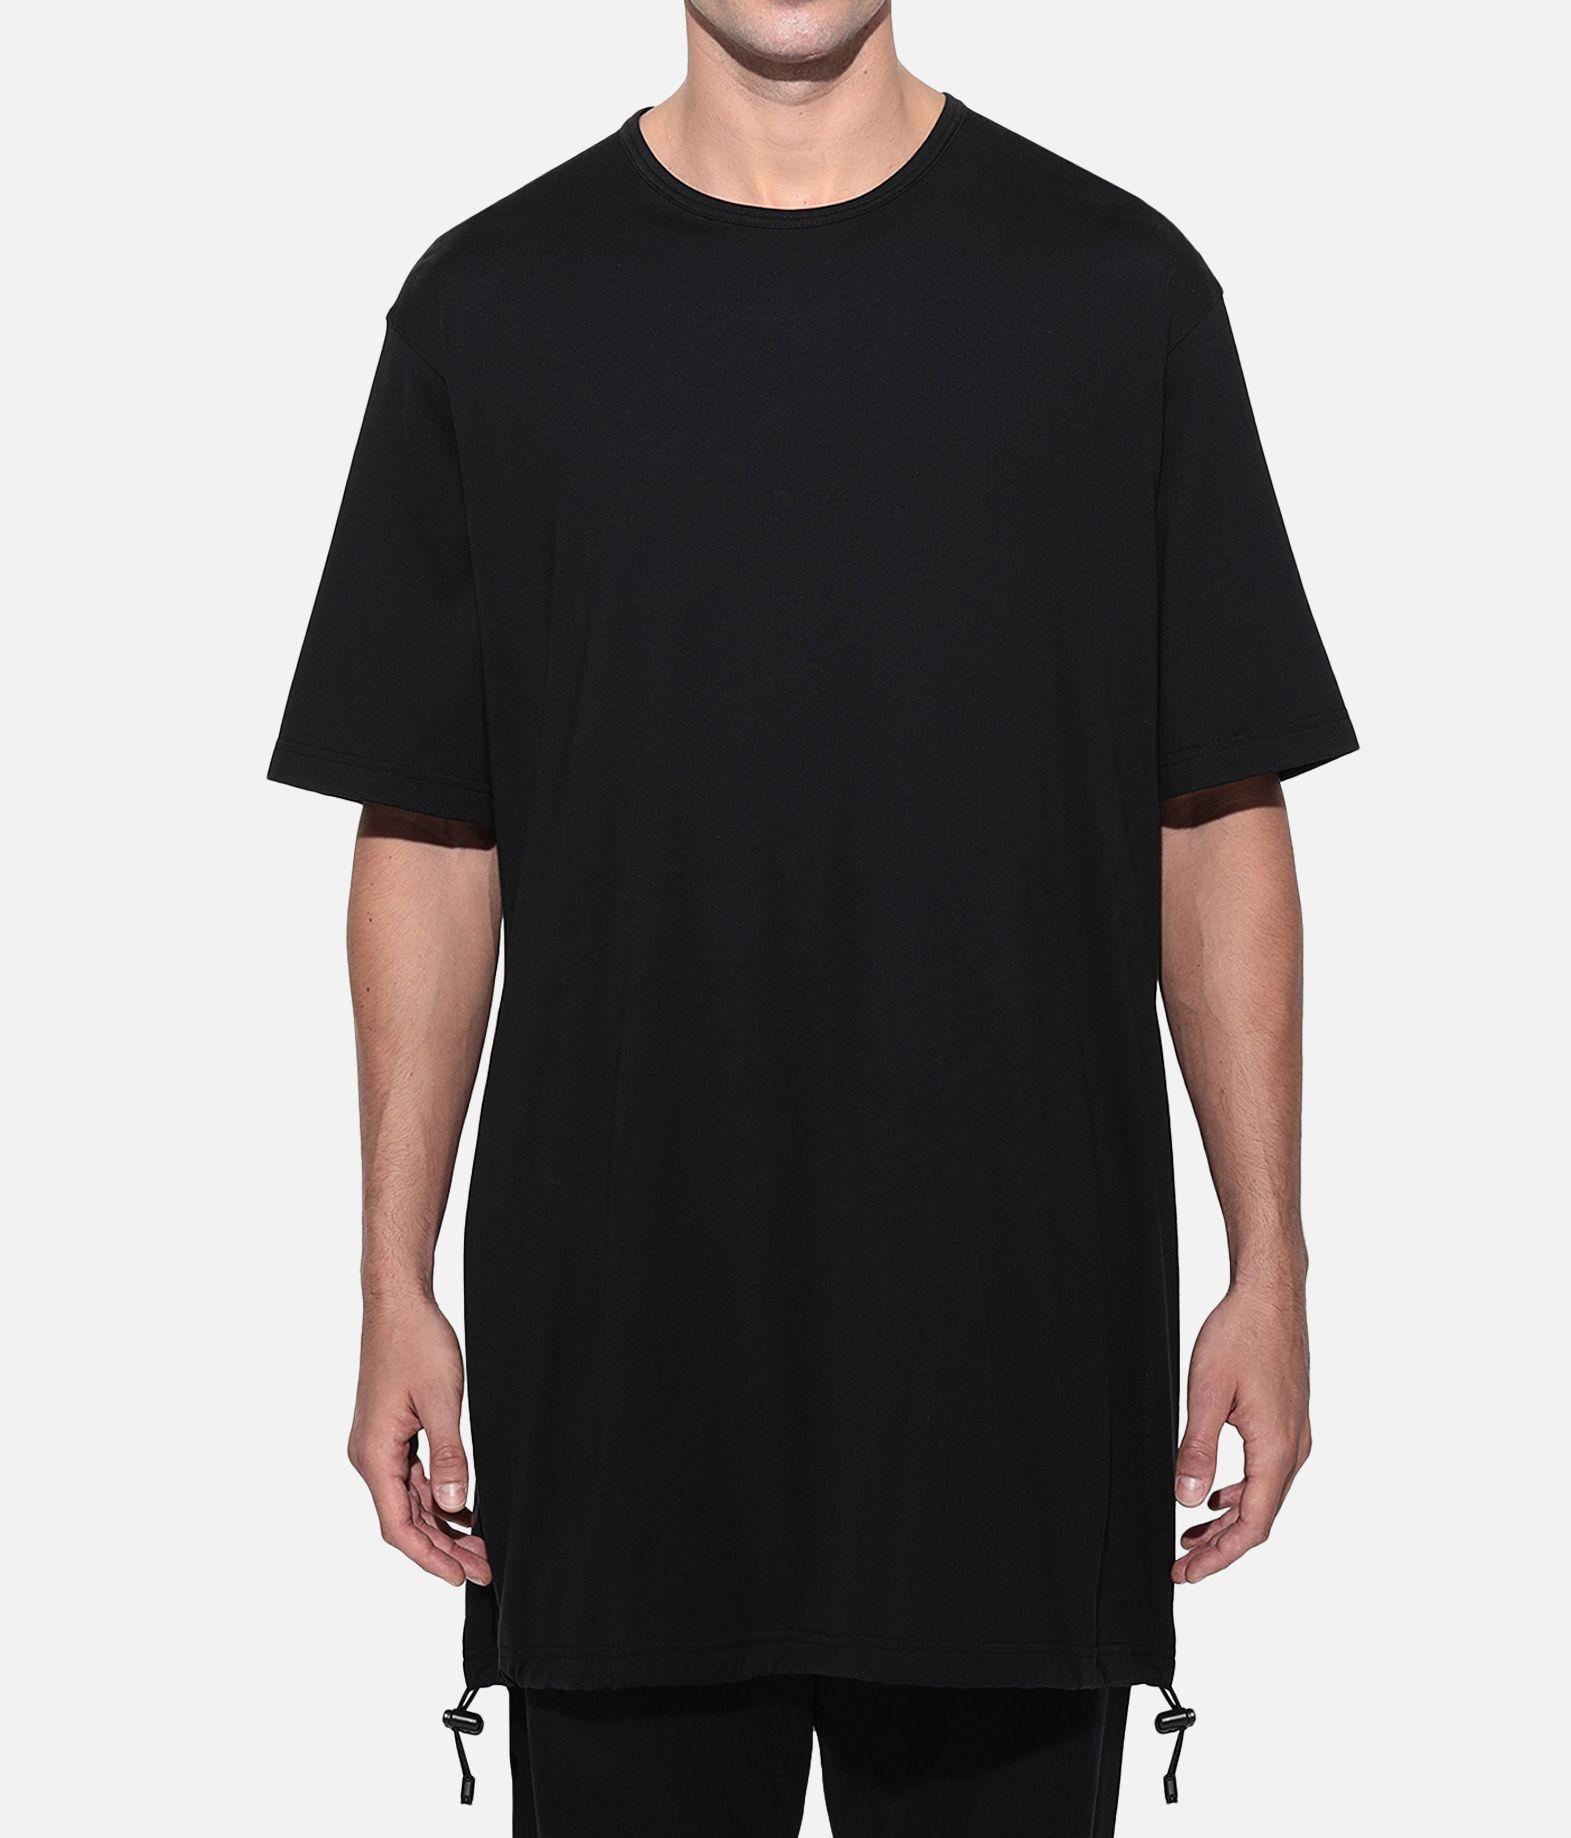 Y-3 Y-3 Drawstring Long Tee  Kurzärmliges T-shirt Herren r